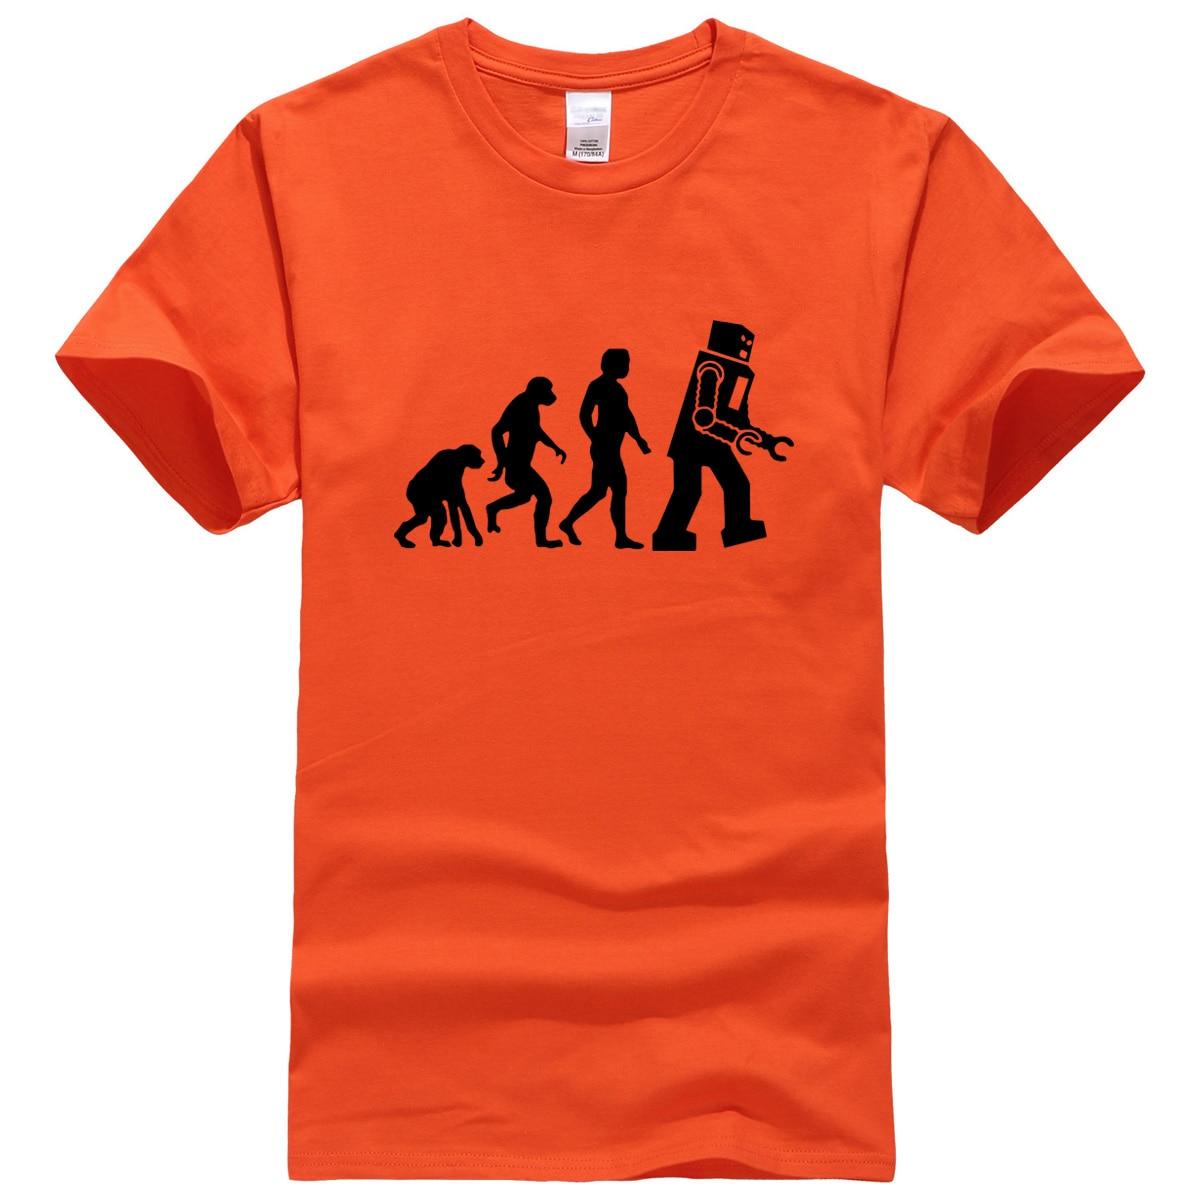 2019 T-shirts The Big Bang Theory Robot Evolution T-shirt tops summer casual men's T-shirts fitness kpop sportswear t shirt men